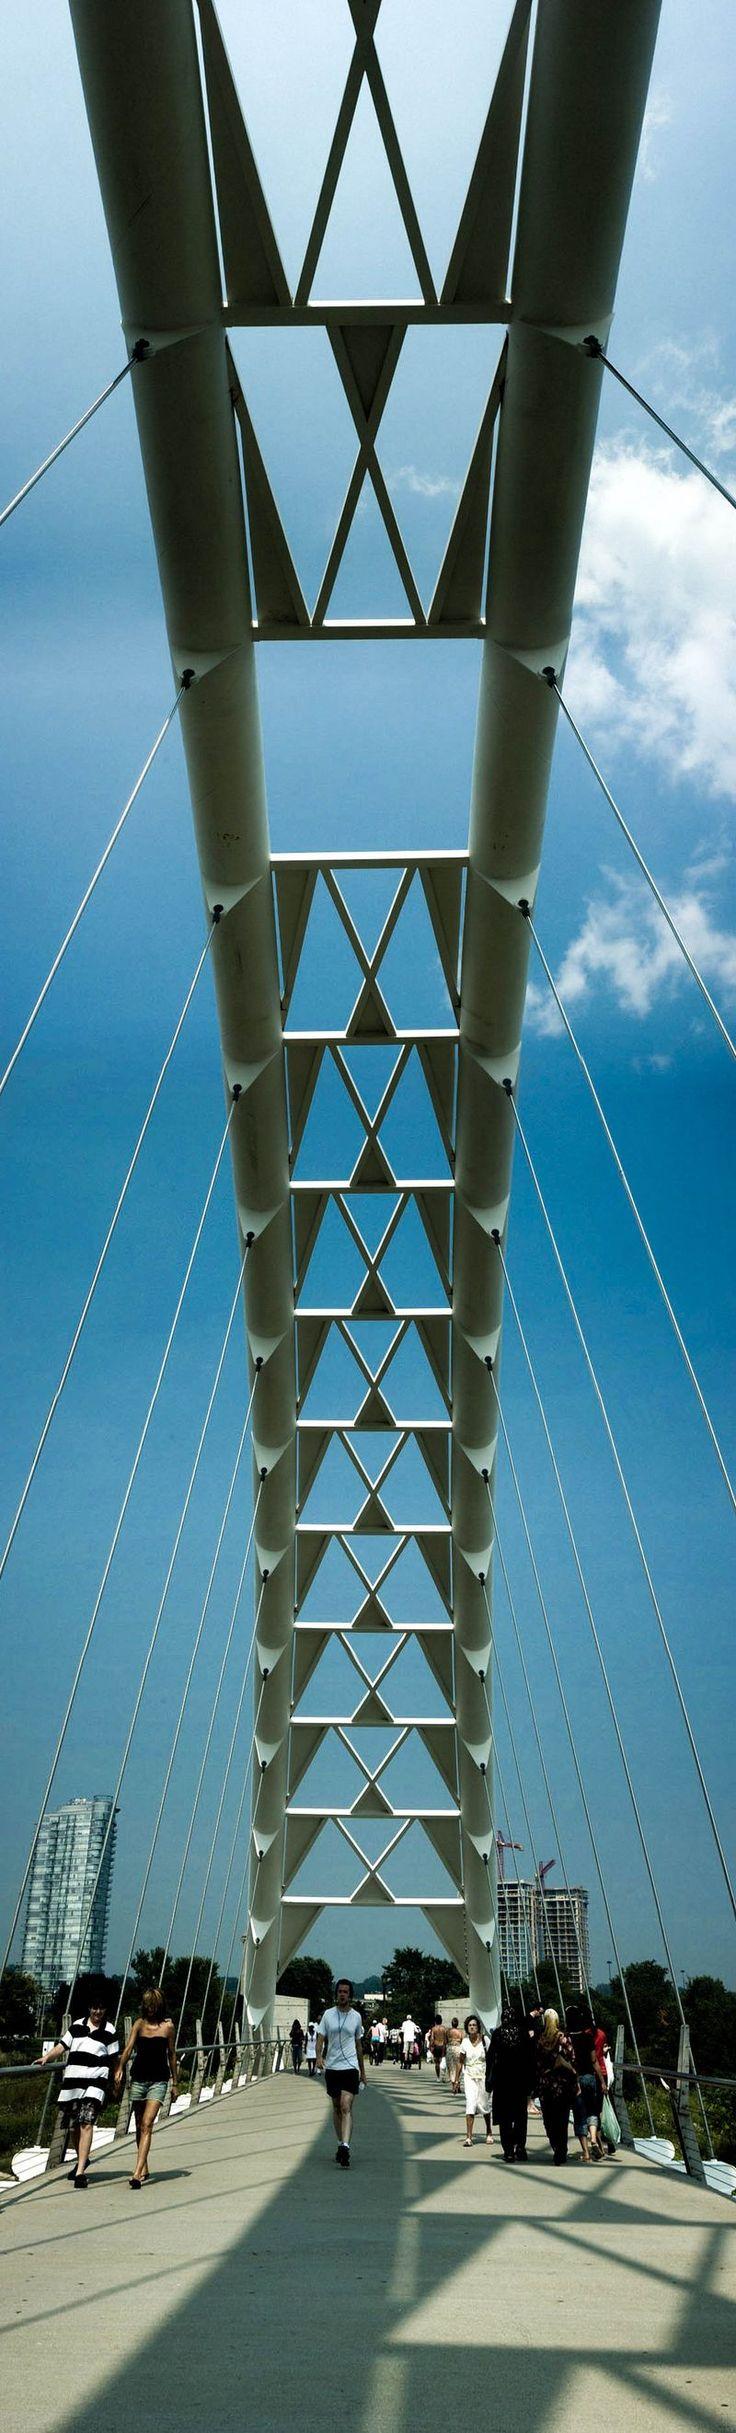 Humber Bay Arch Bridge - Toronto, Canada; Humber River